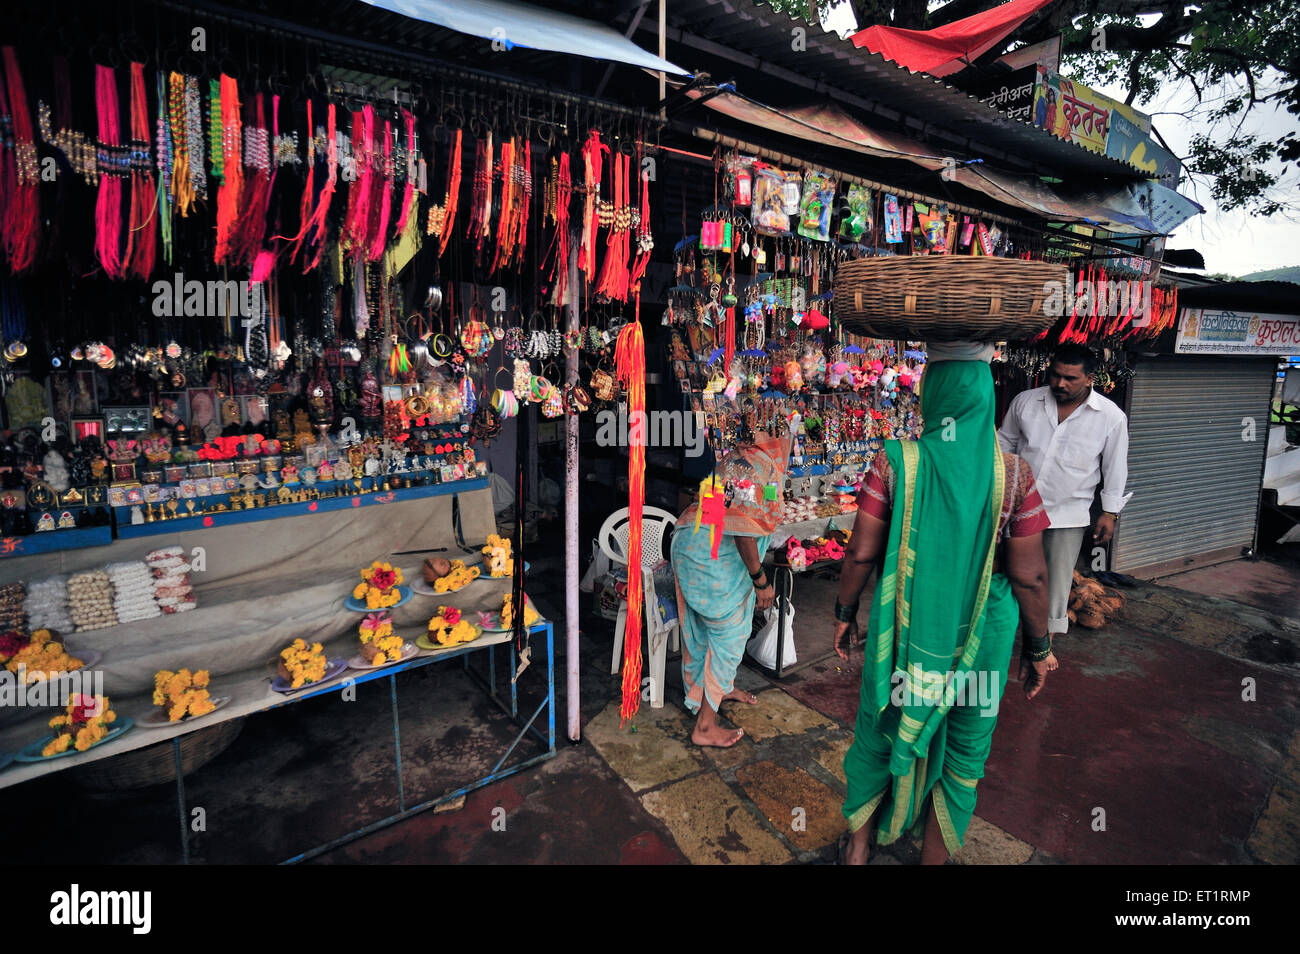 Tienda de material para el culto en Samara Maharashtra India Asia Imagen De Stock